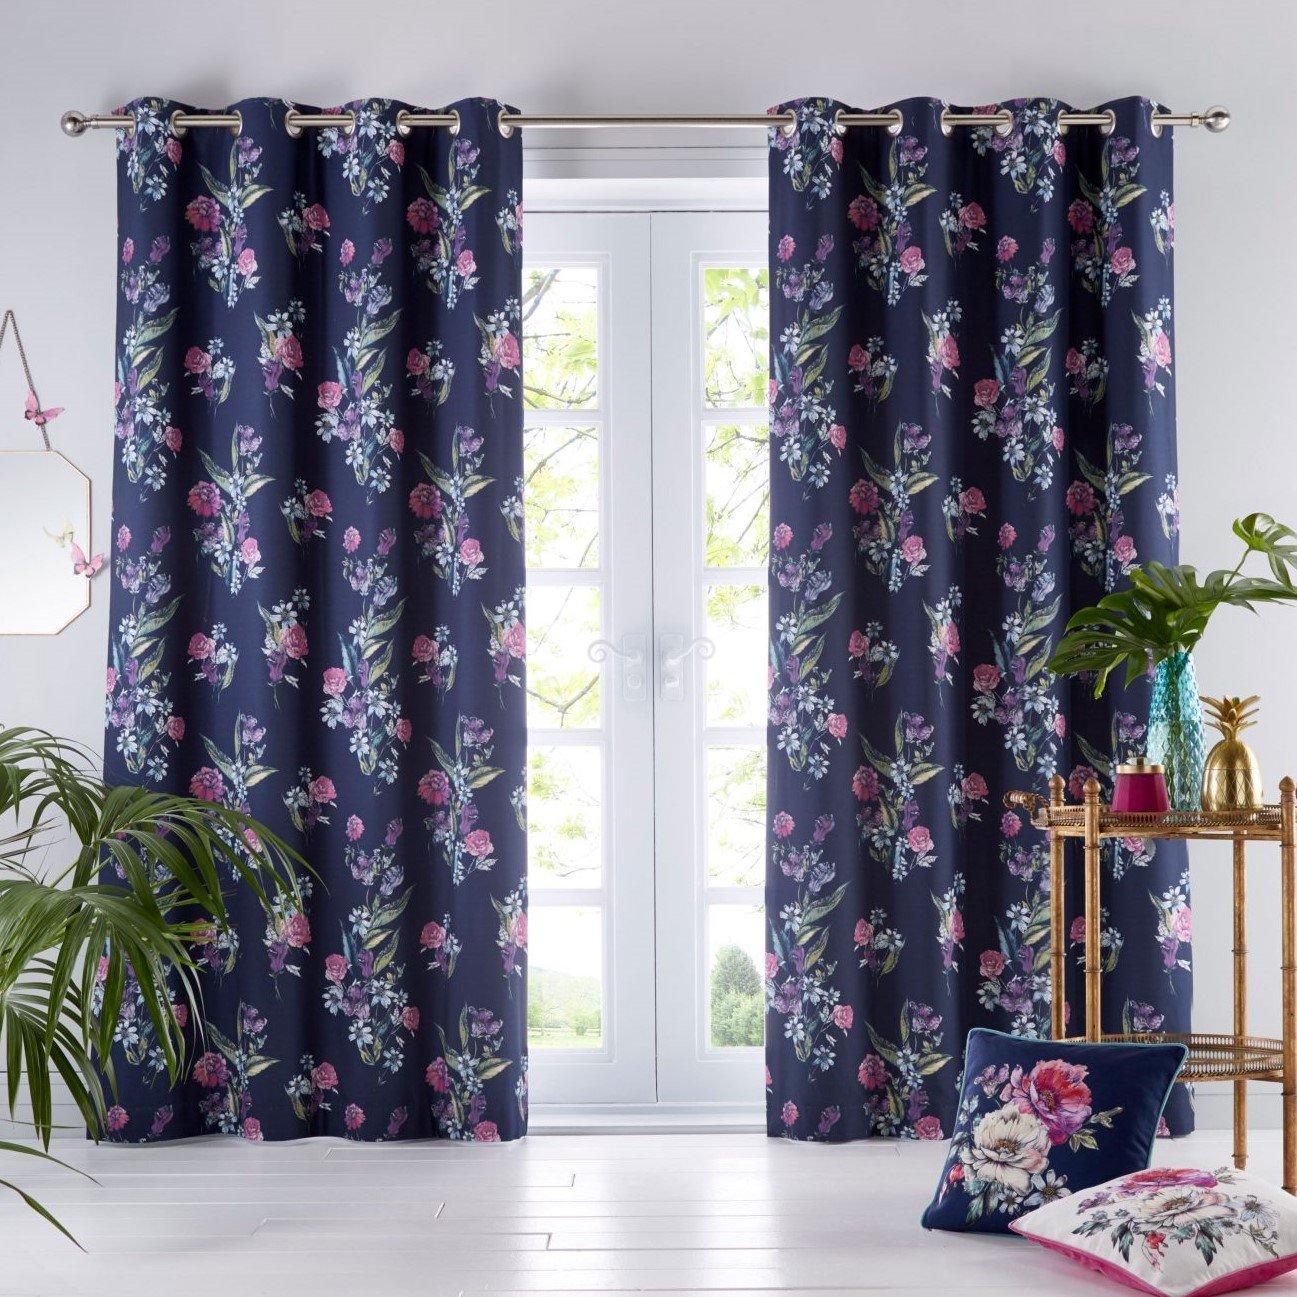 plats-curtains